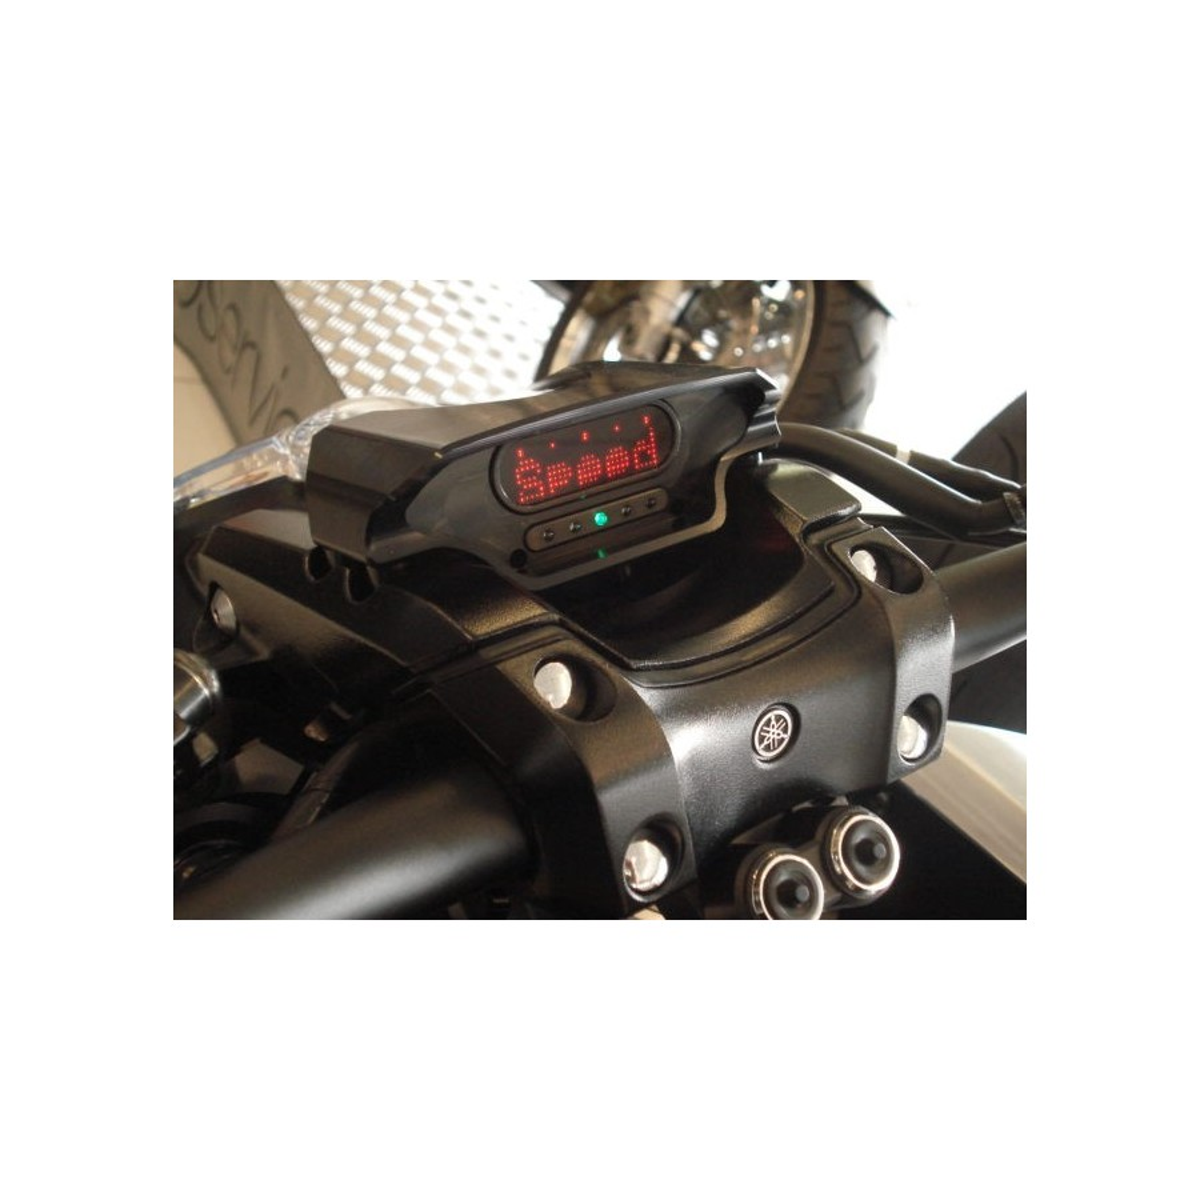 COMPTEUR + SUPPORT ANO NOIR VMAX1700